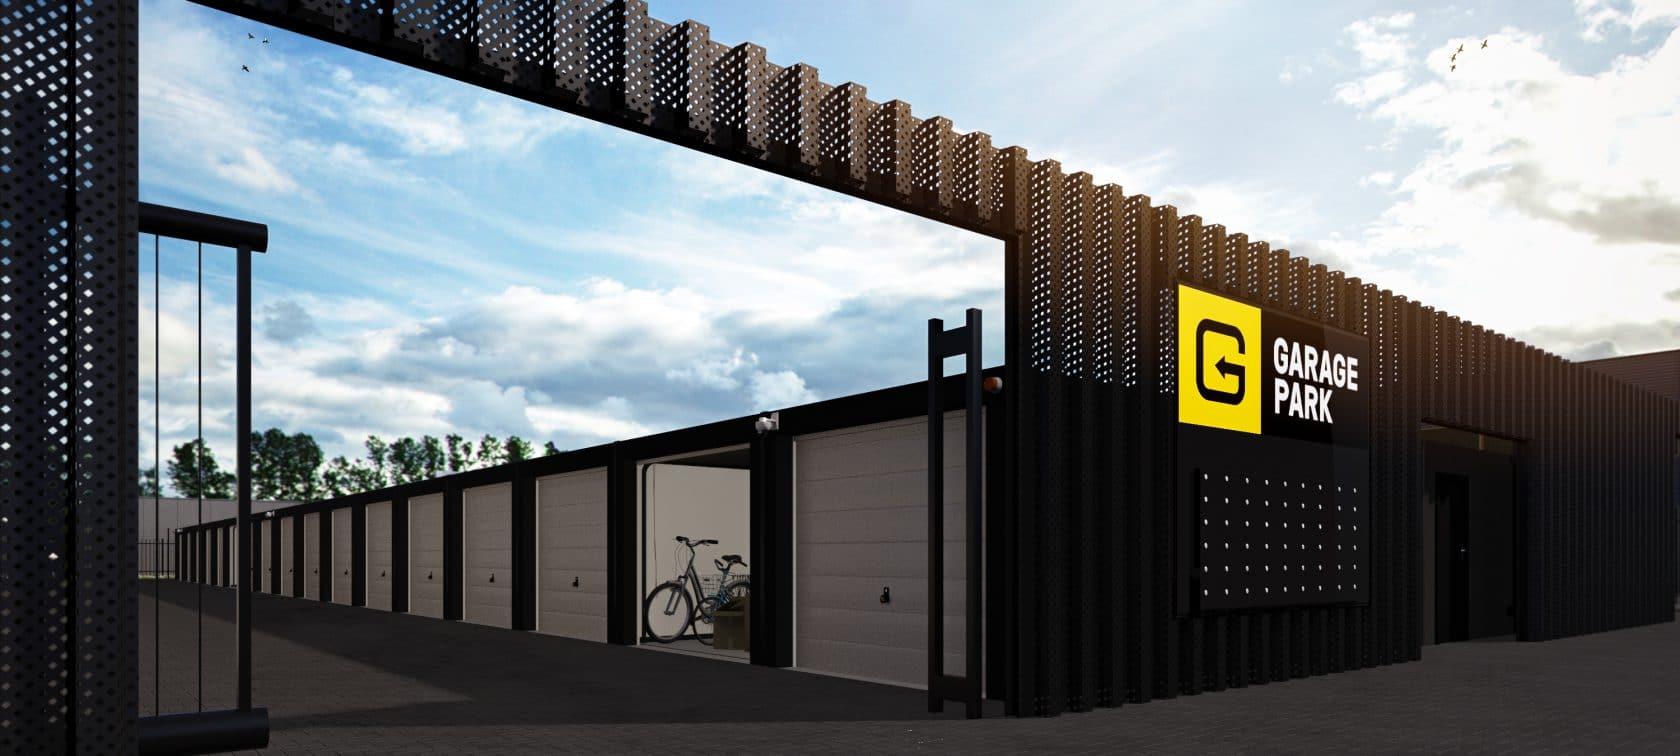 GaragePark Groningen - Garageboxen Groningen